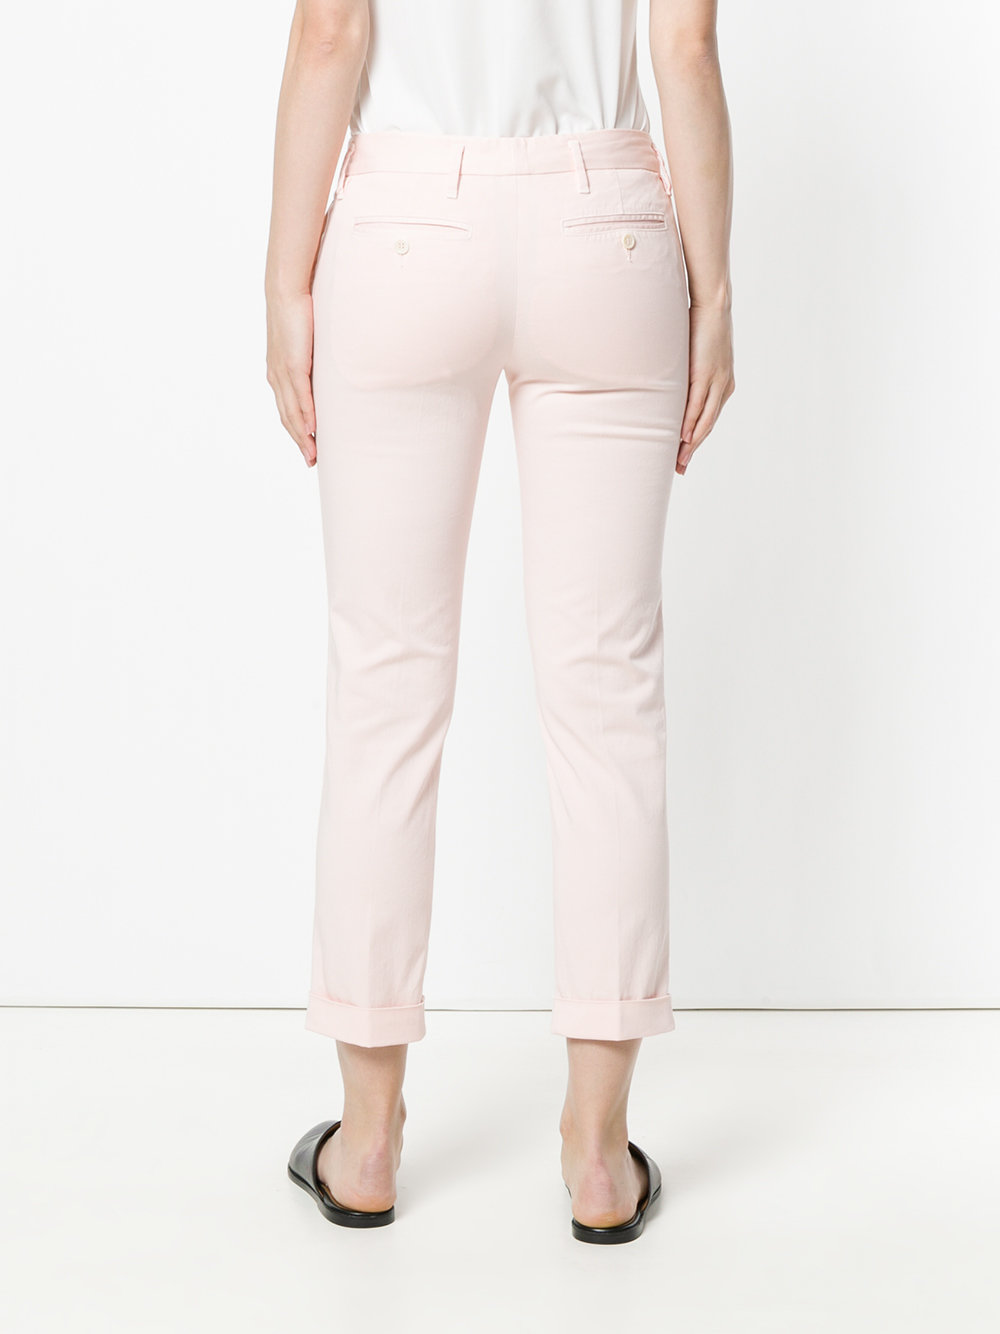 Pantaloni skinny rosa chiaro in misto cotone ALBERTO ASPESI |  | H102-F02685283